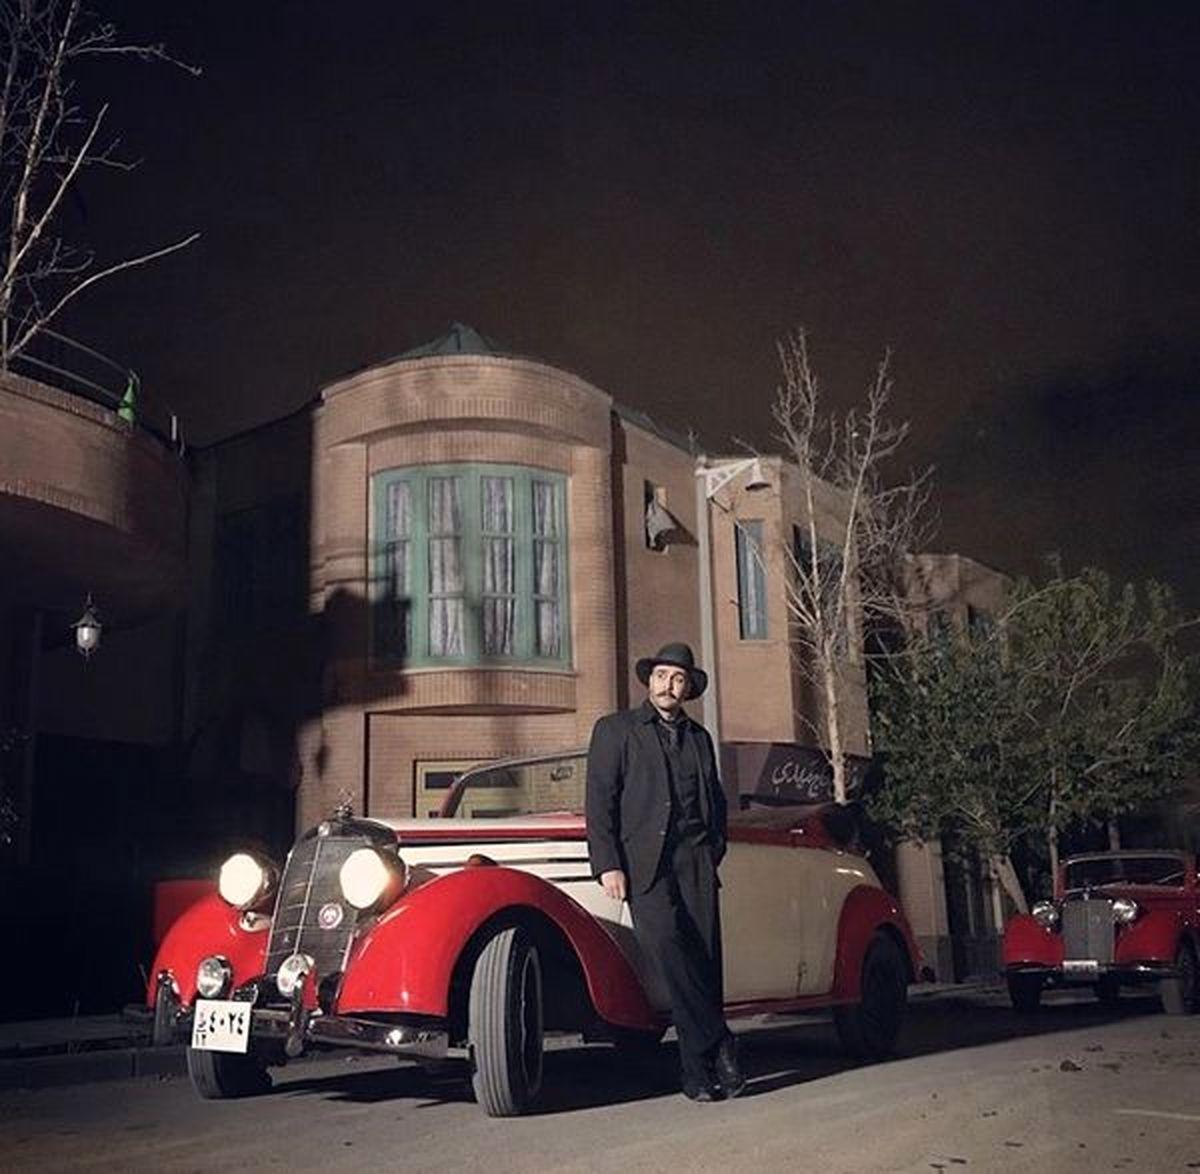 پوریا پورسرخ با یک ژیان سرخ پلاک اصفهان-١١